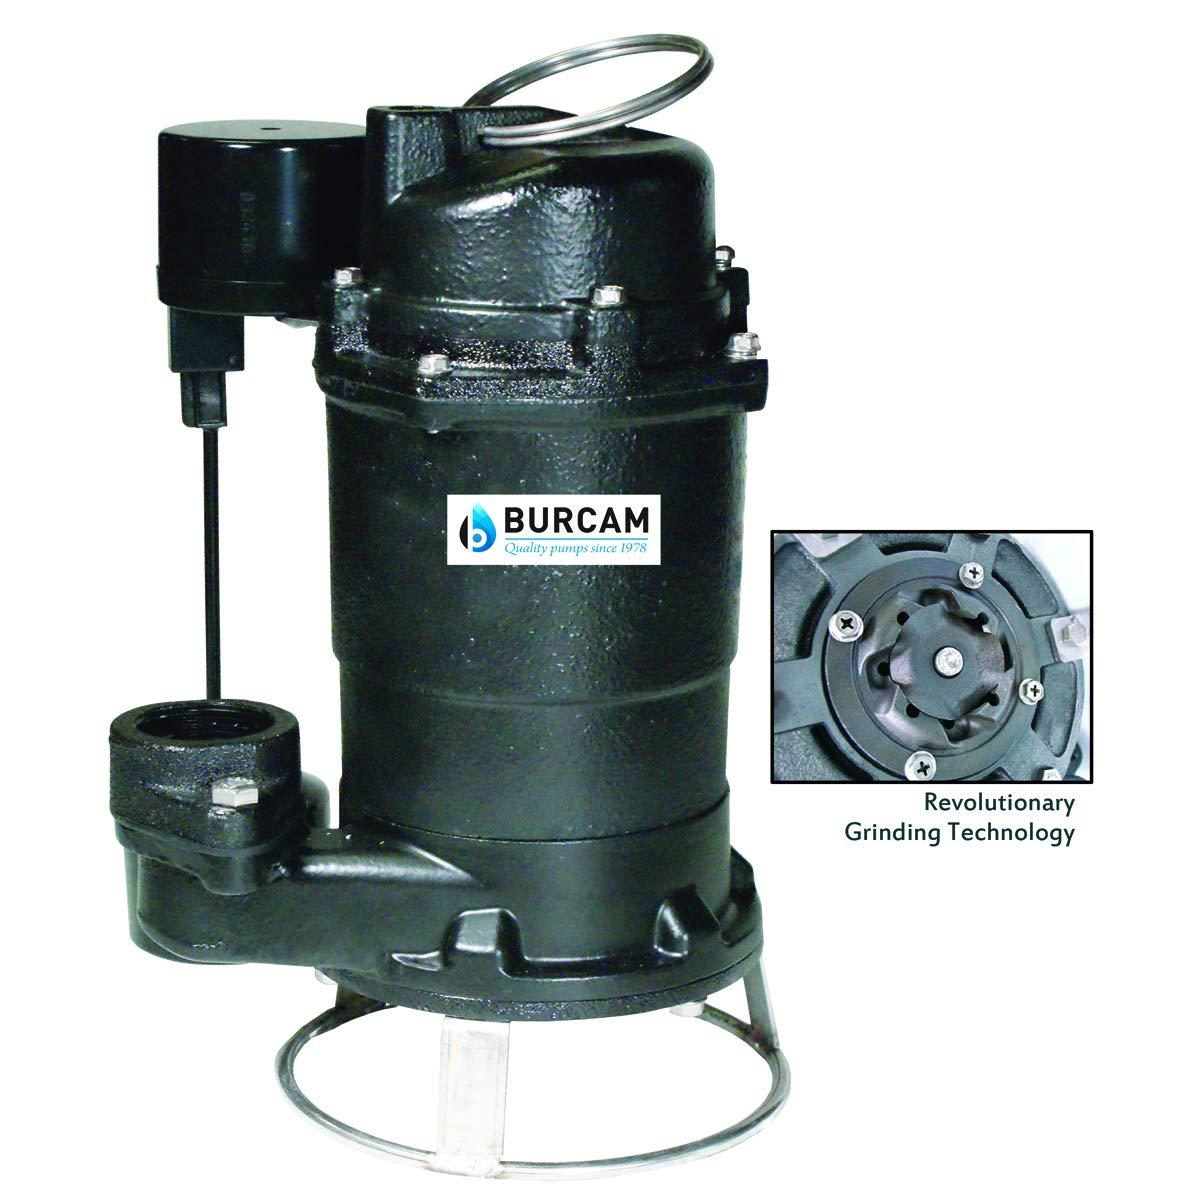 BURCAM 400700P 3/4 HP Sewage Grinder Pump